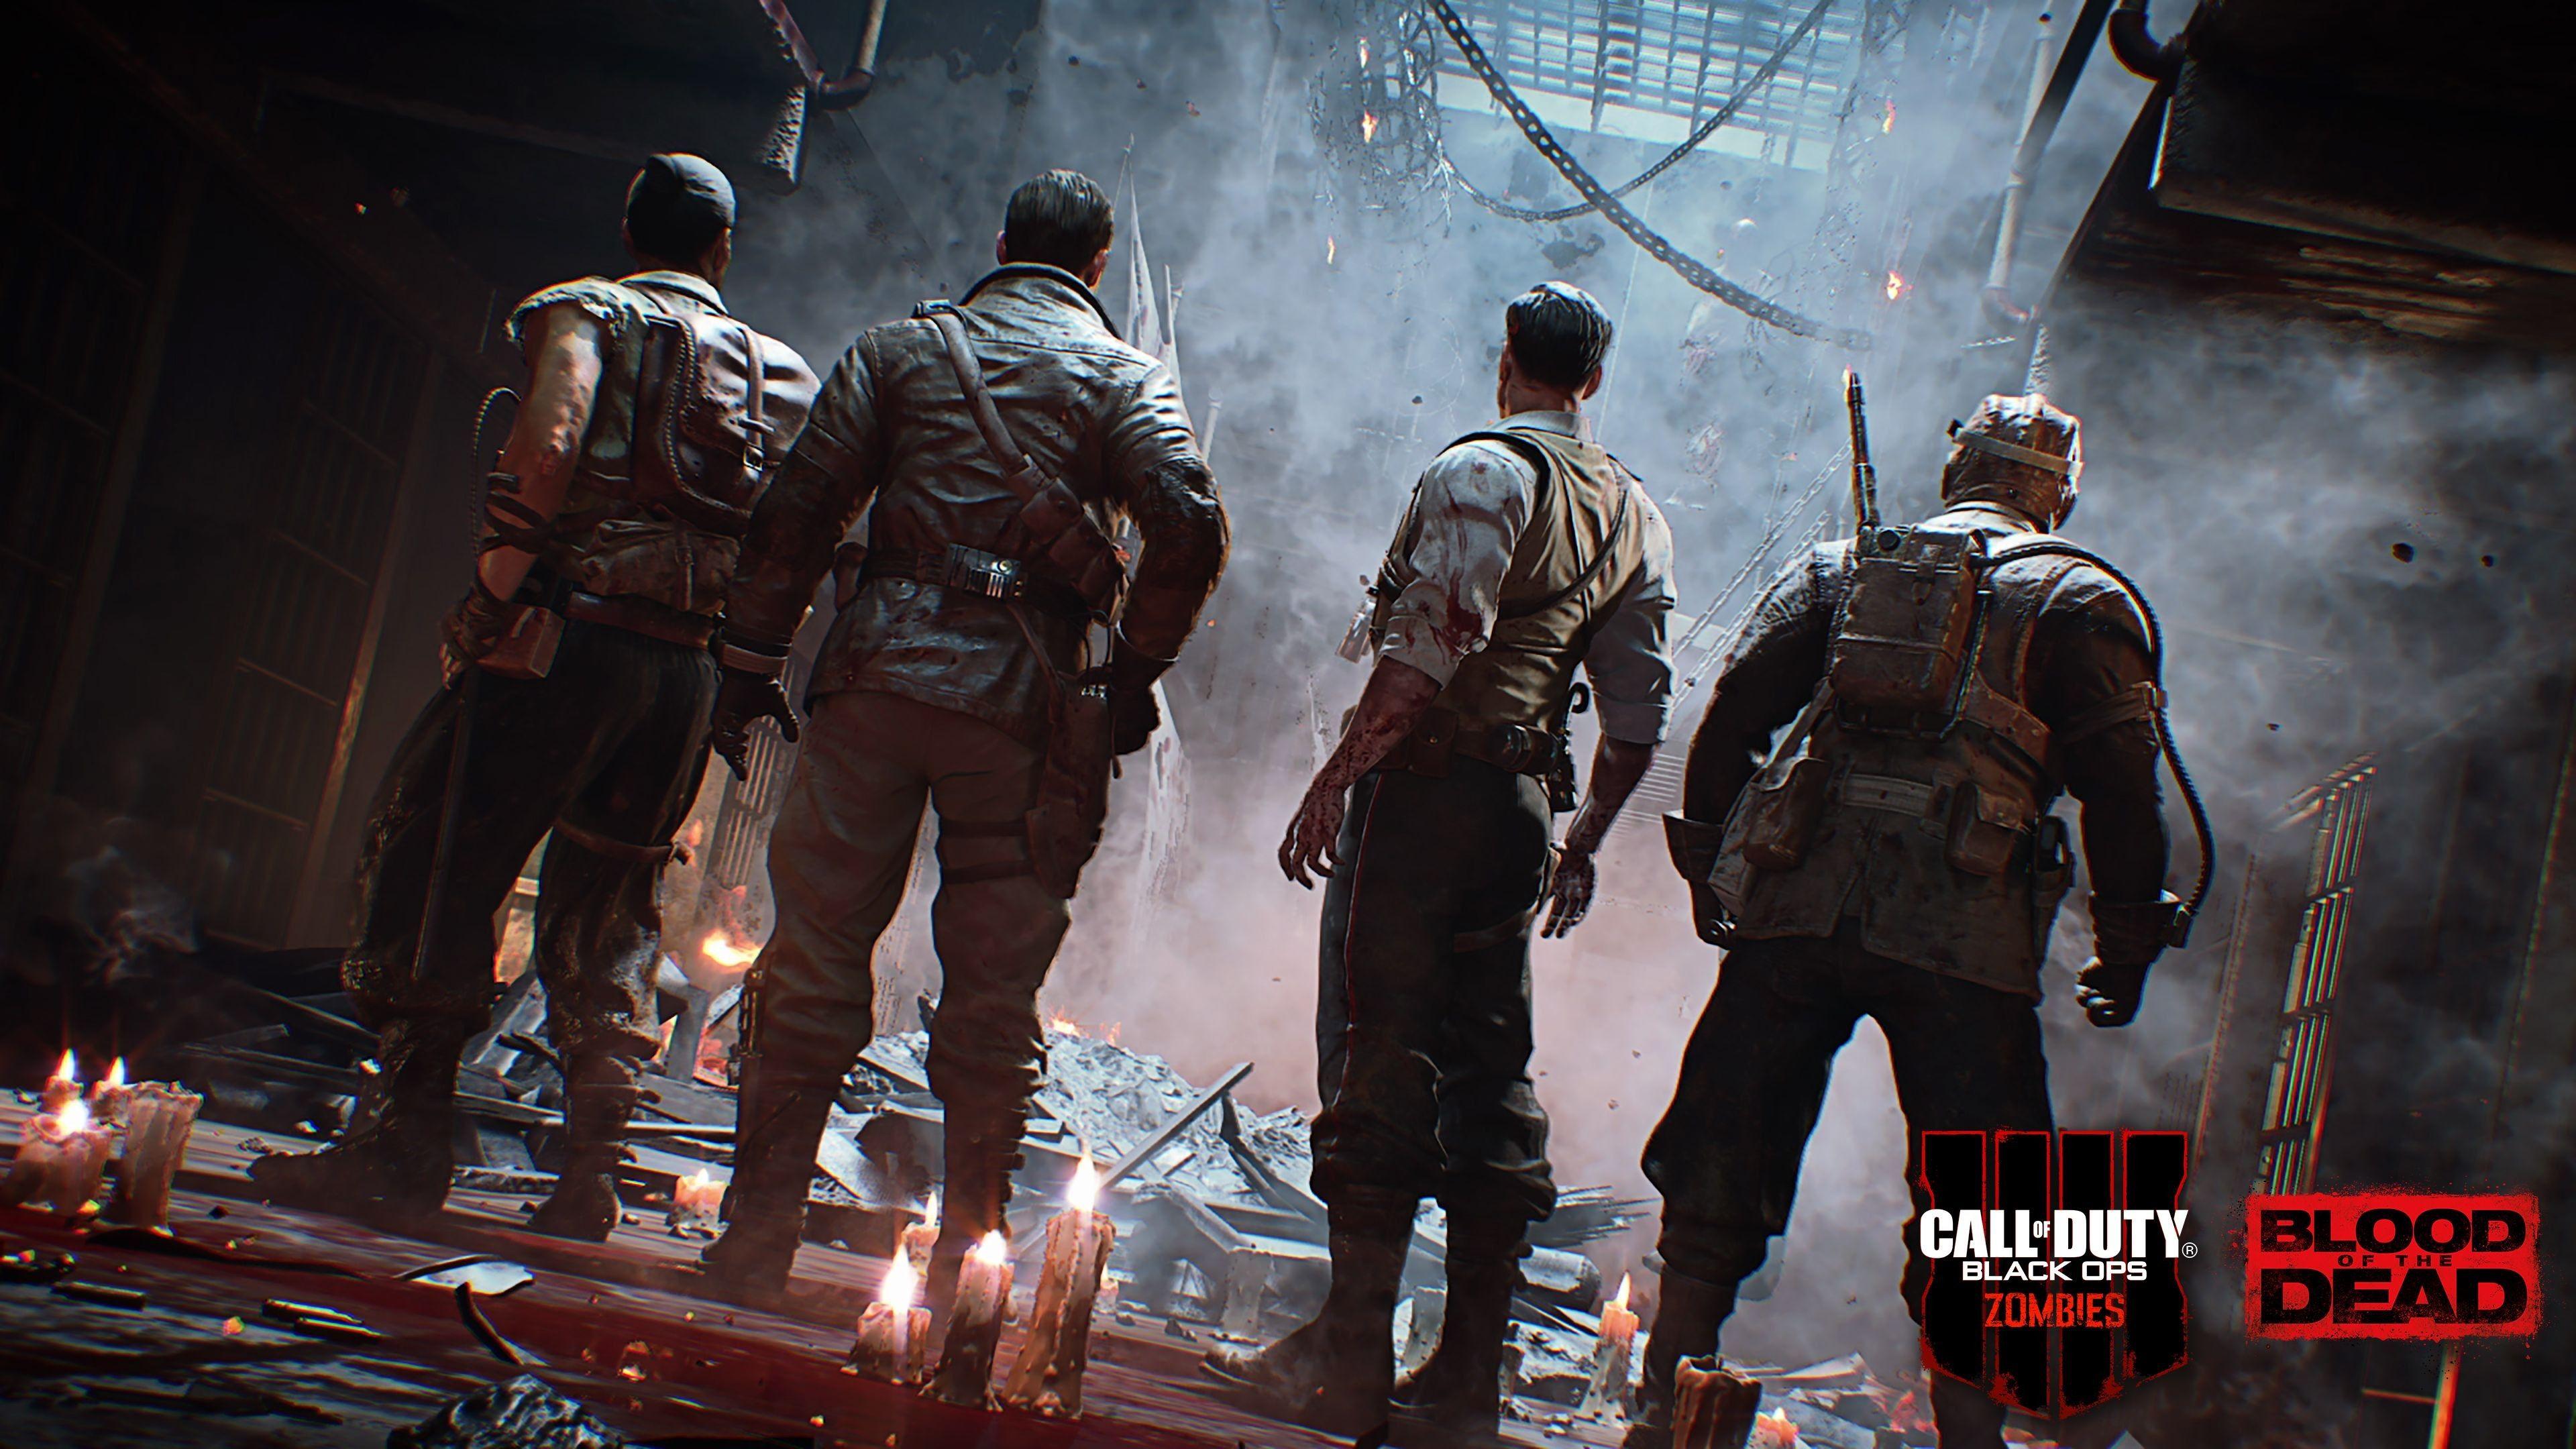 New Black Ops 4 Wallpaper Di 2020